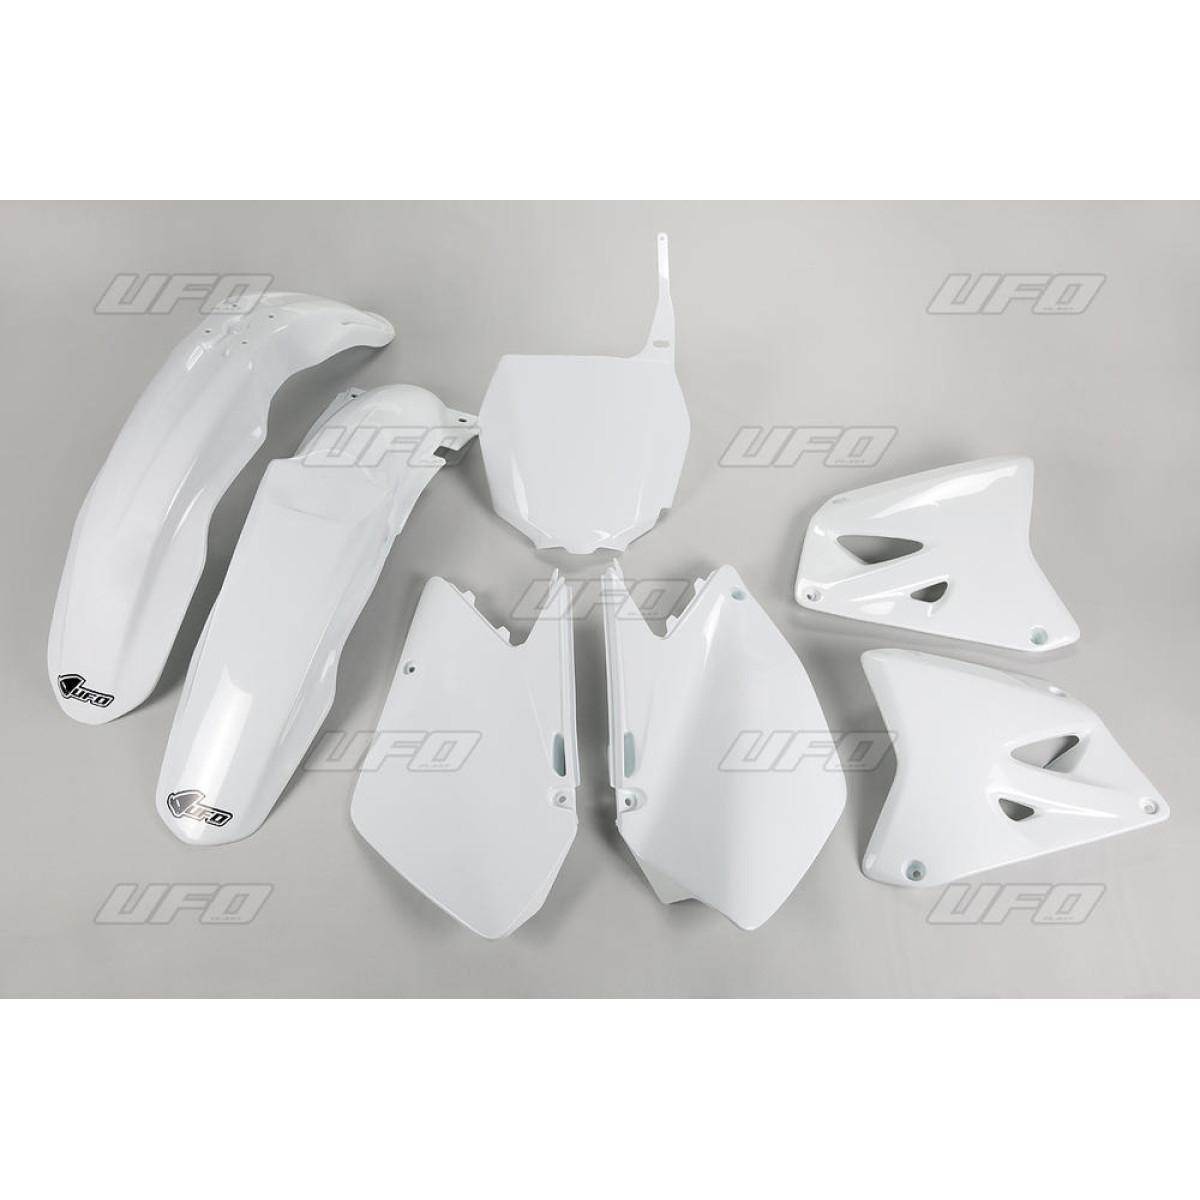 Kit plastique UFO Suzuki 125 RM 06-08 blanc